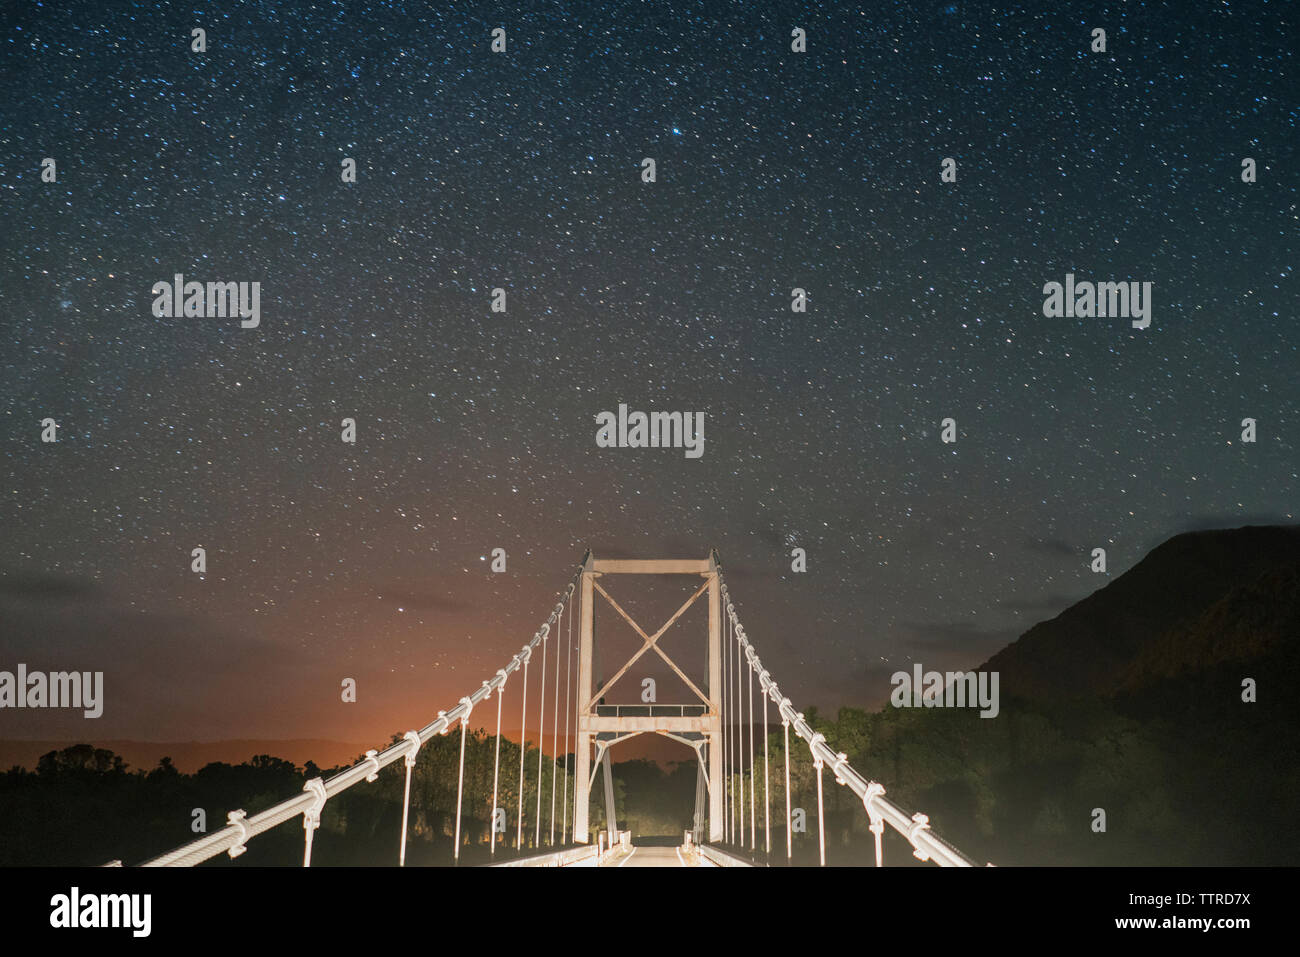 Bridge against star field at night - Stock Image